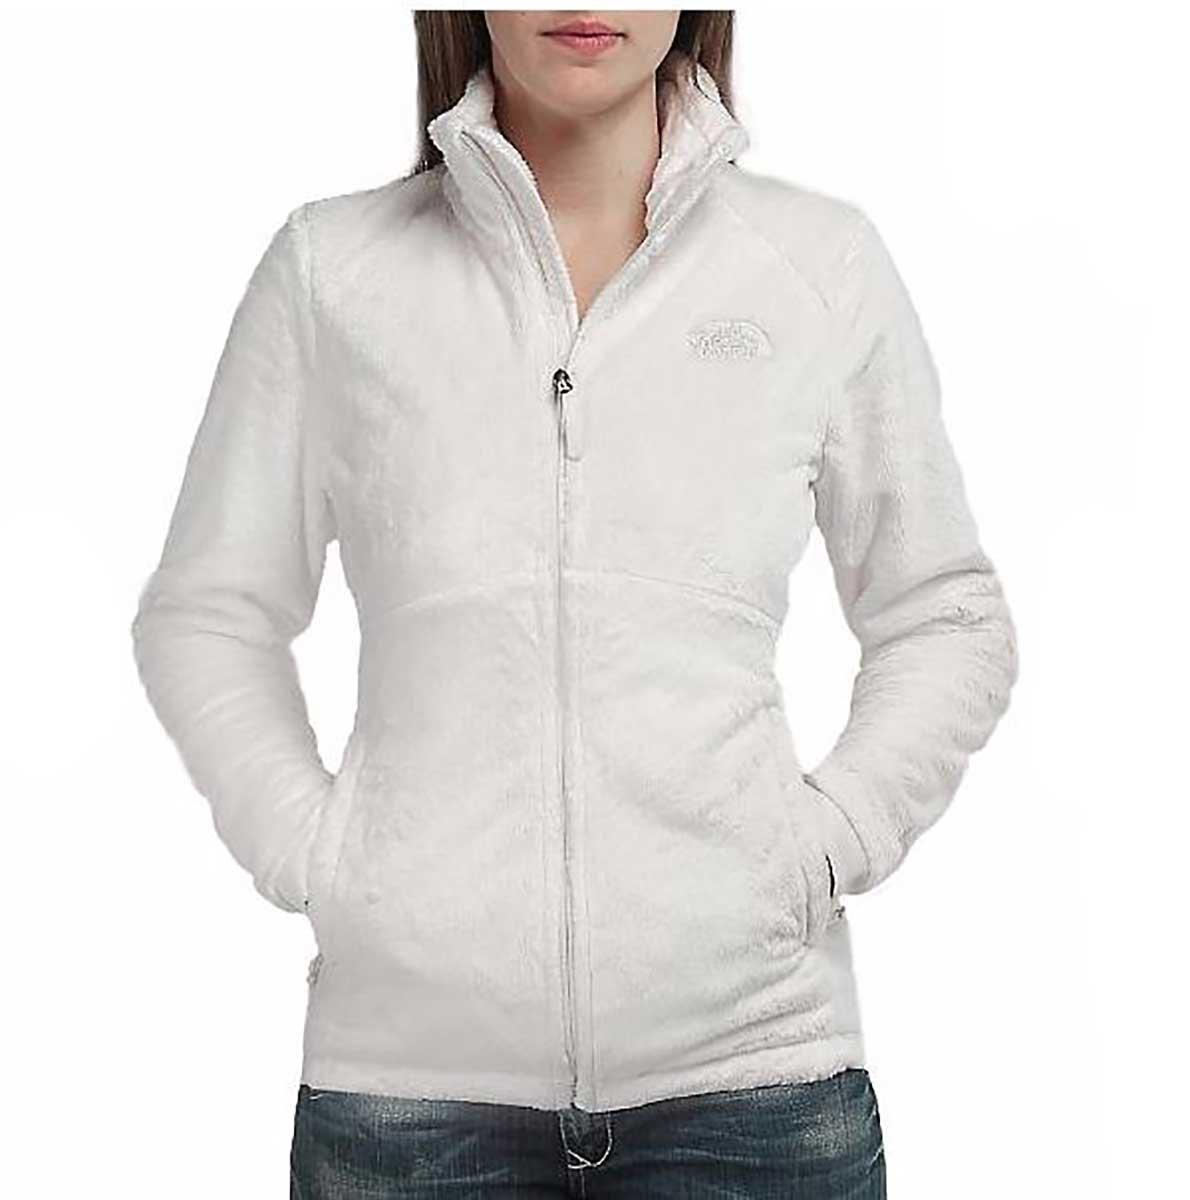 North Face Tech-osito Jacket Womens Style : C663PK-L Gardenwhite